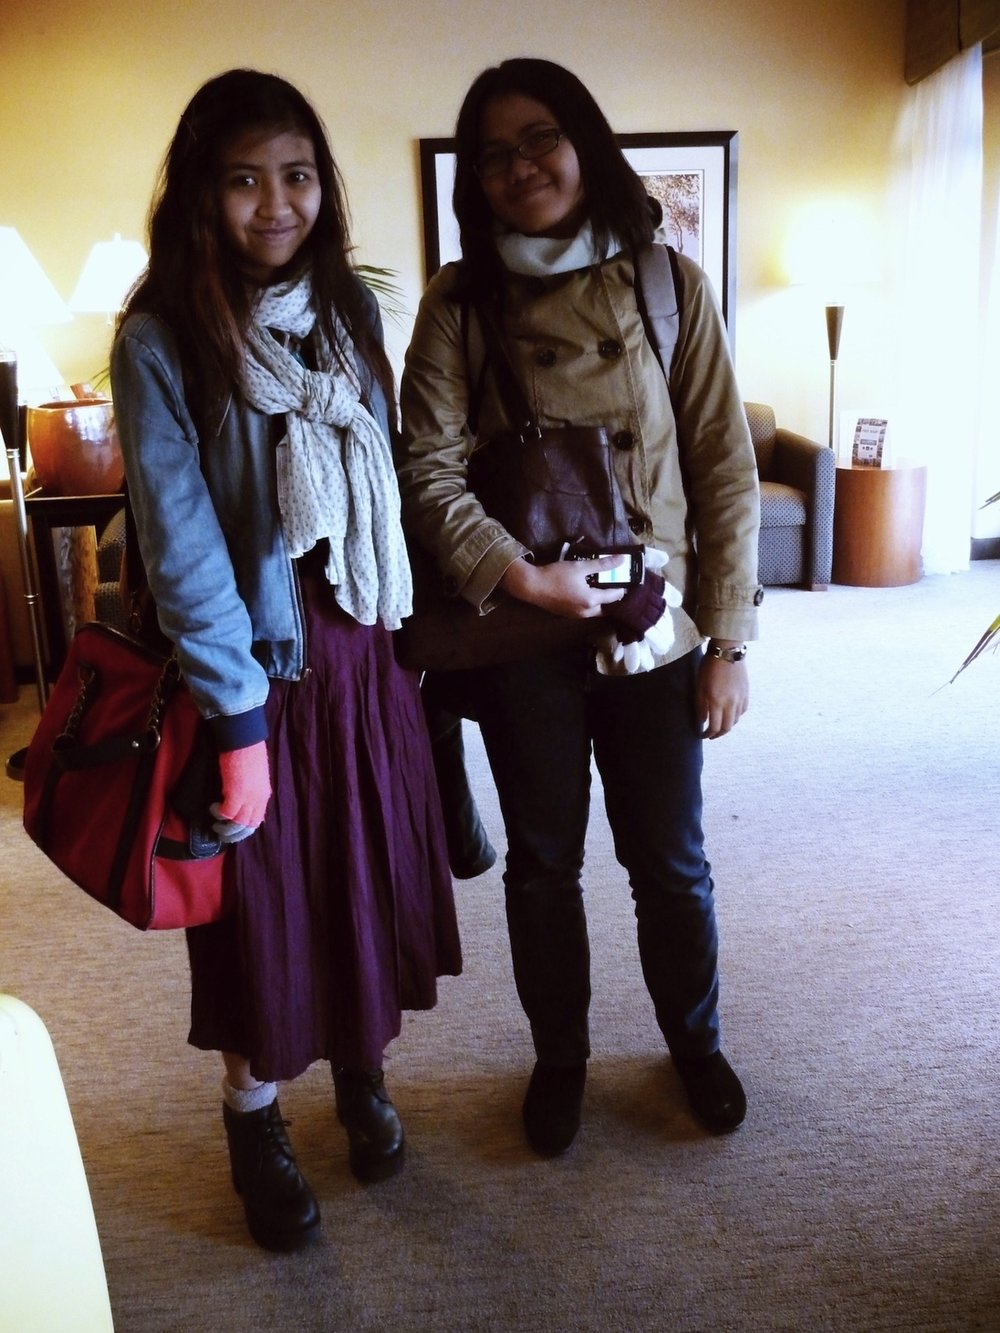 Me and my sister, Atinna Gunawan. March 3rd 2012 .